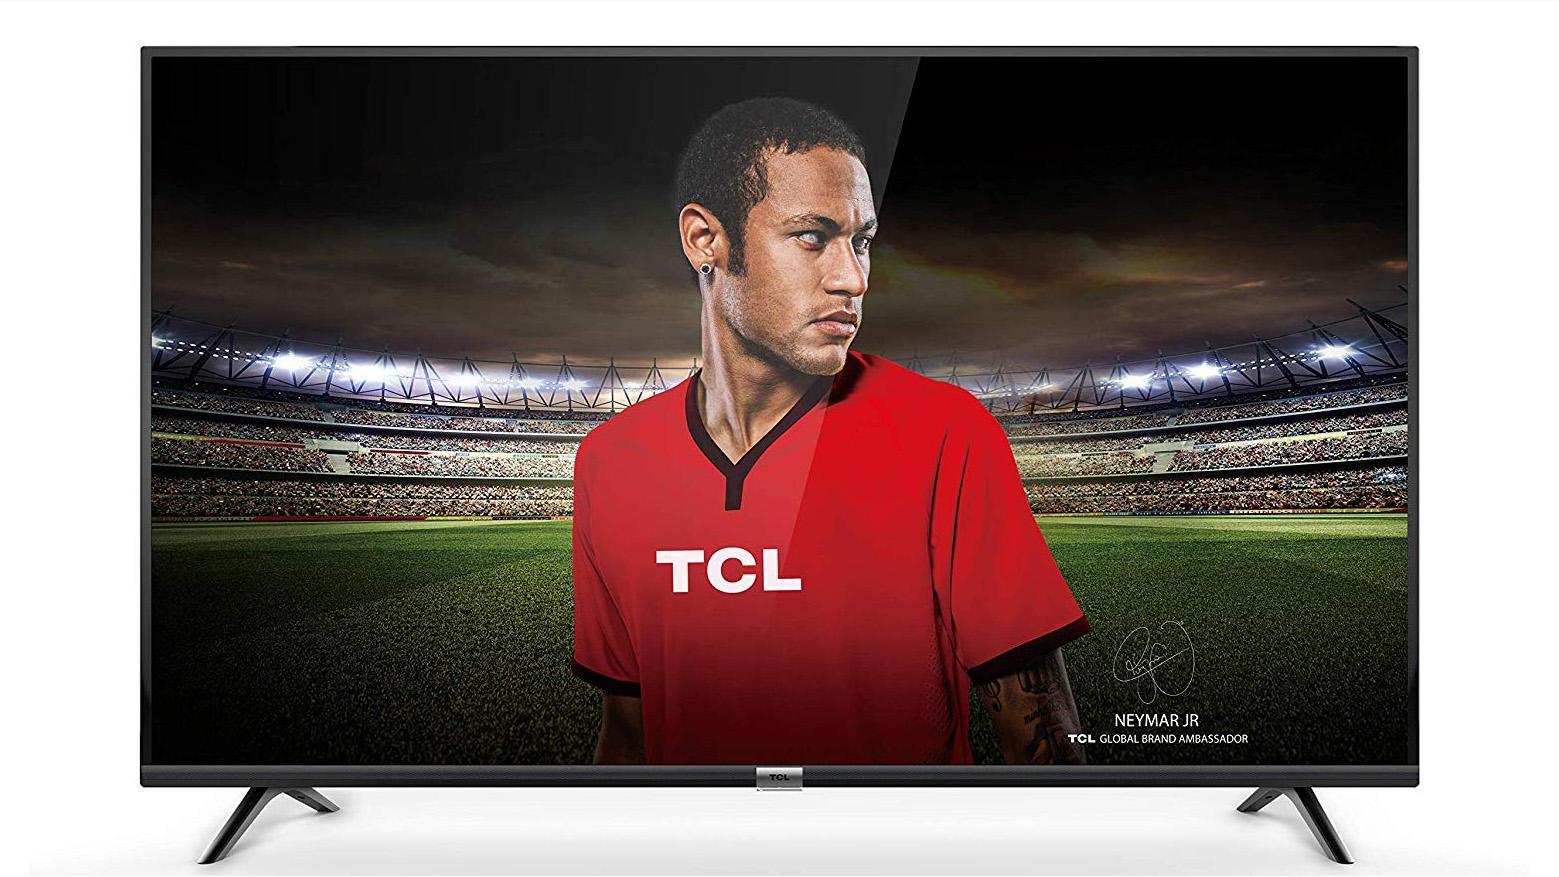 a6fadbe0 Should you buy a TCL TV? | What Hi-Fi?